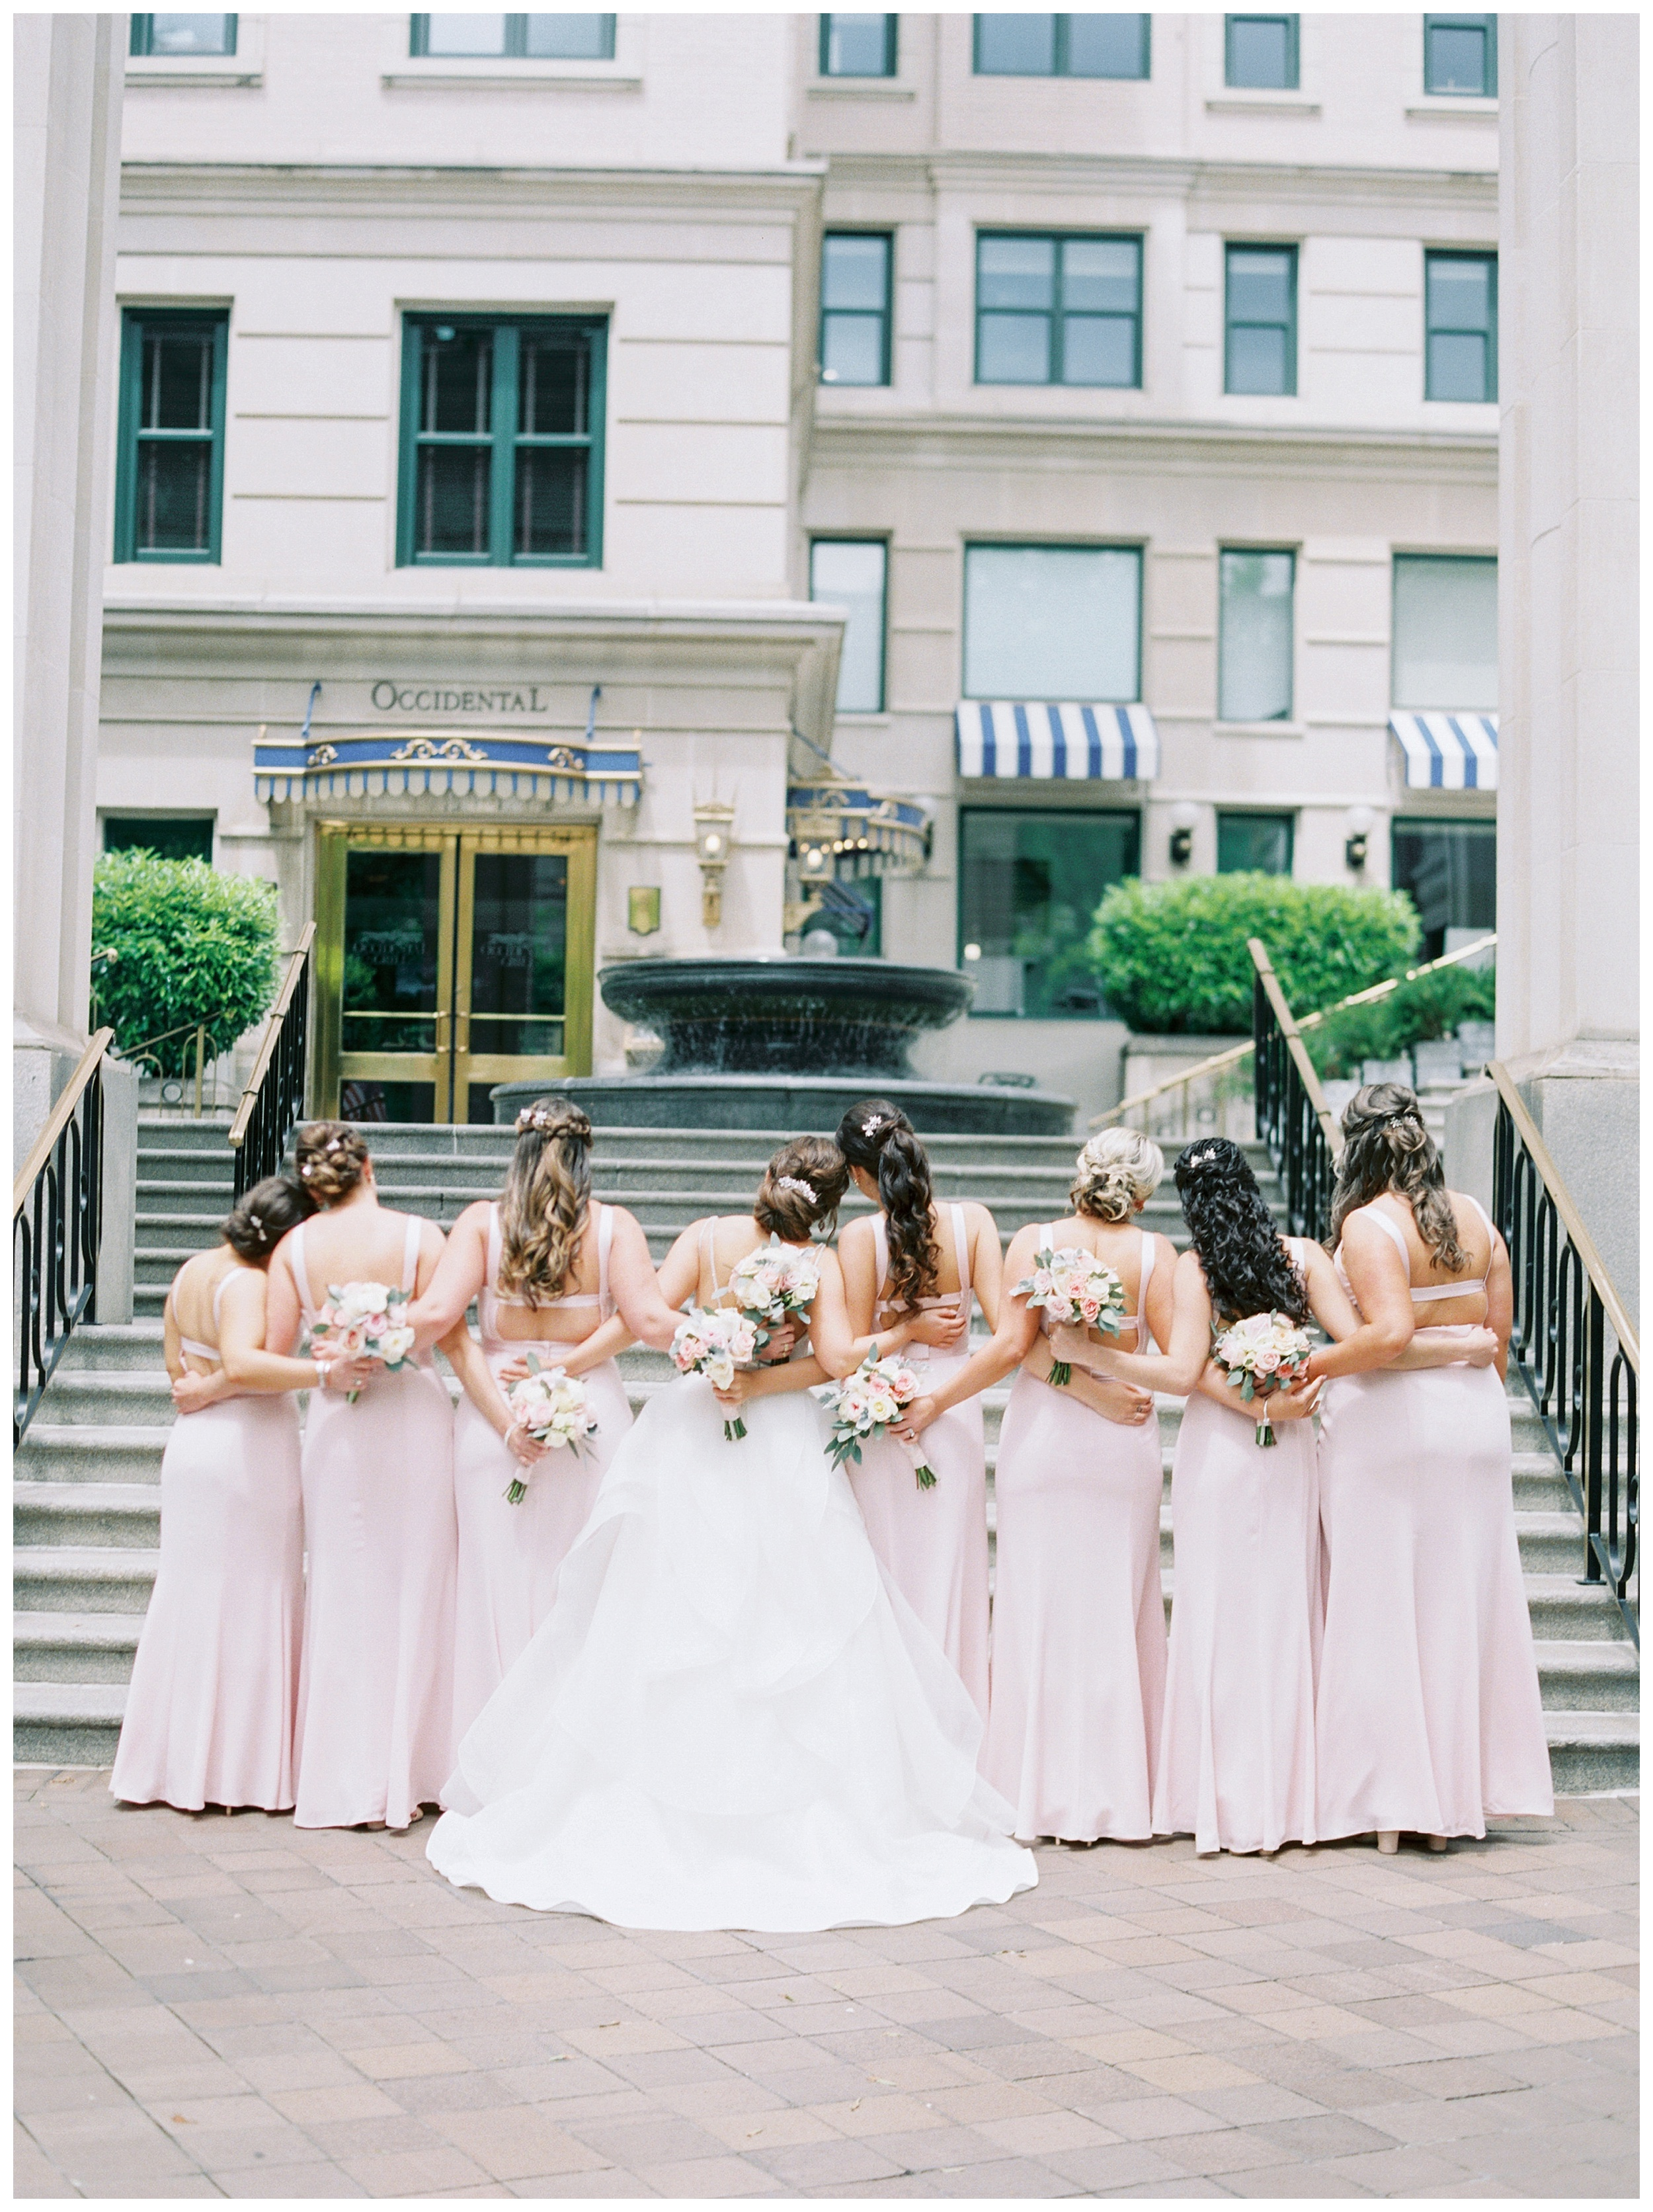 DAR Constitution Hall Wedding Wedding | Daughters of the American Revolution Wedding | District of Columbia Film Wedding Photographer Kir Tuben_0031.jpg